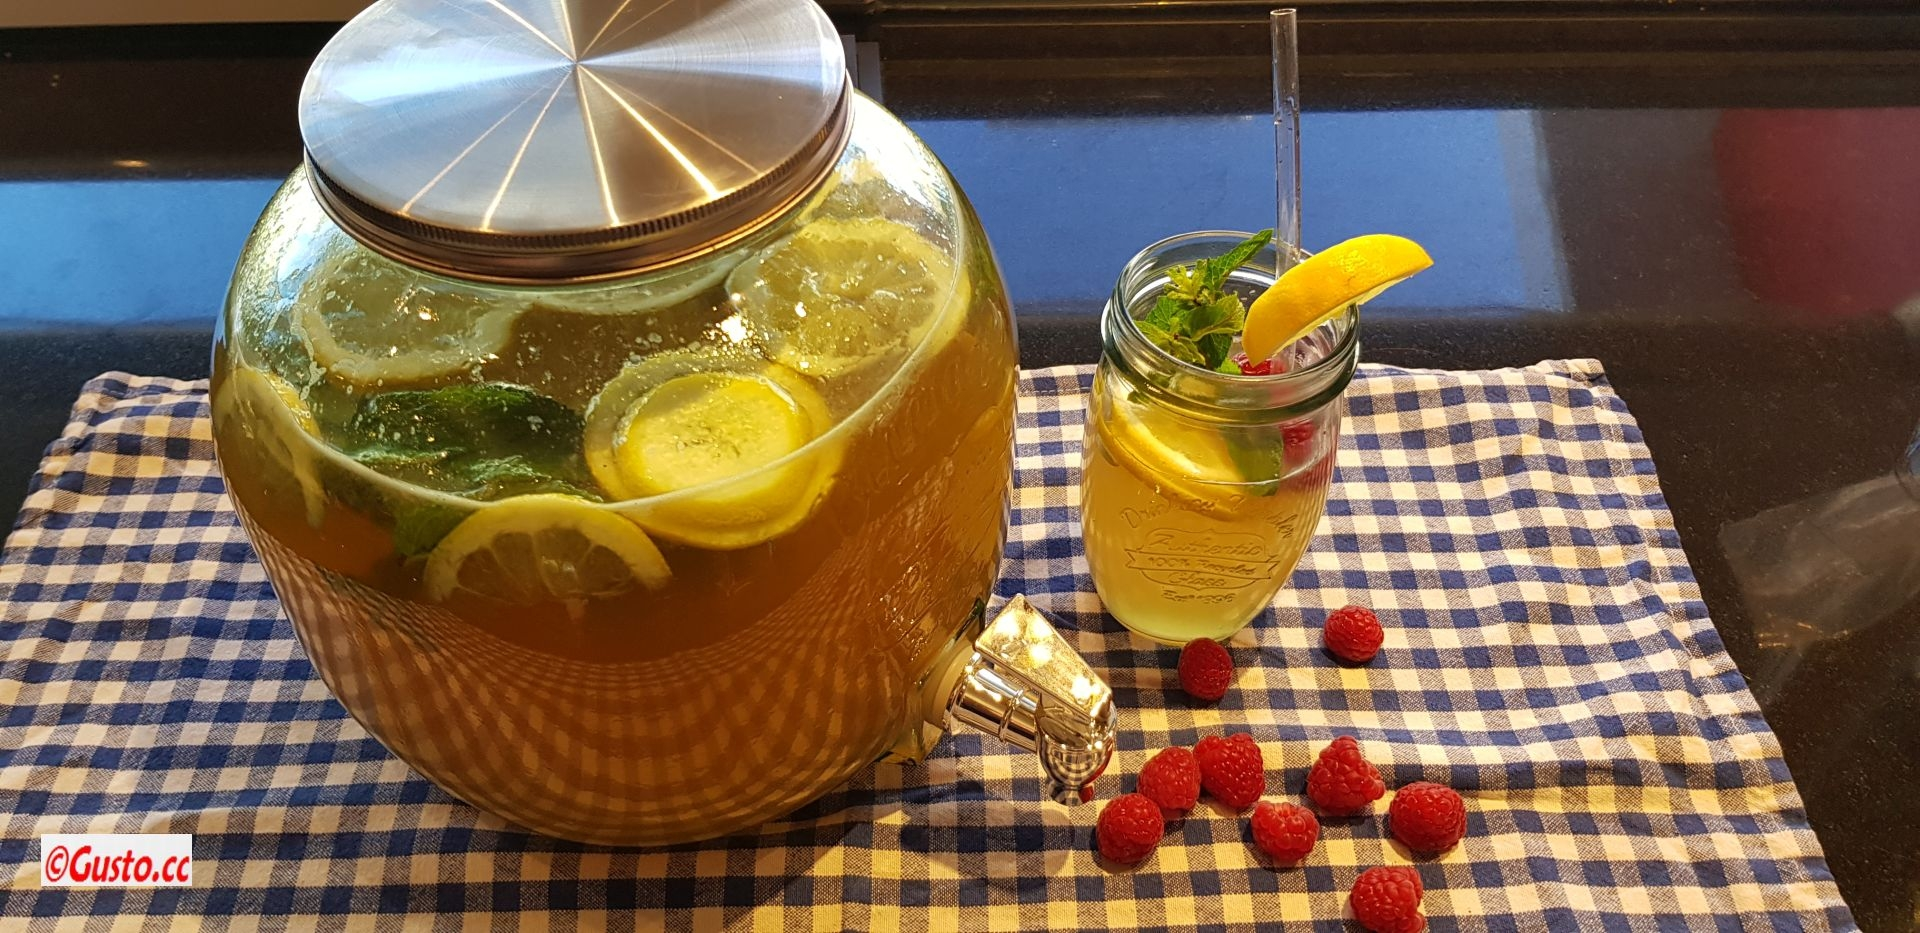 Hausgemachte Zitronen-Minze-Limonade